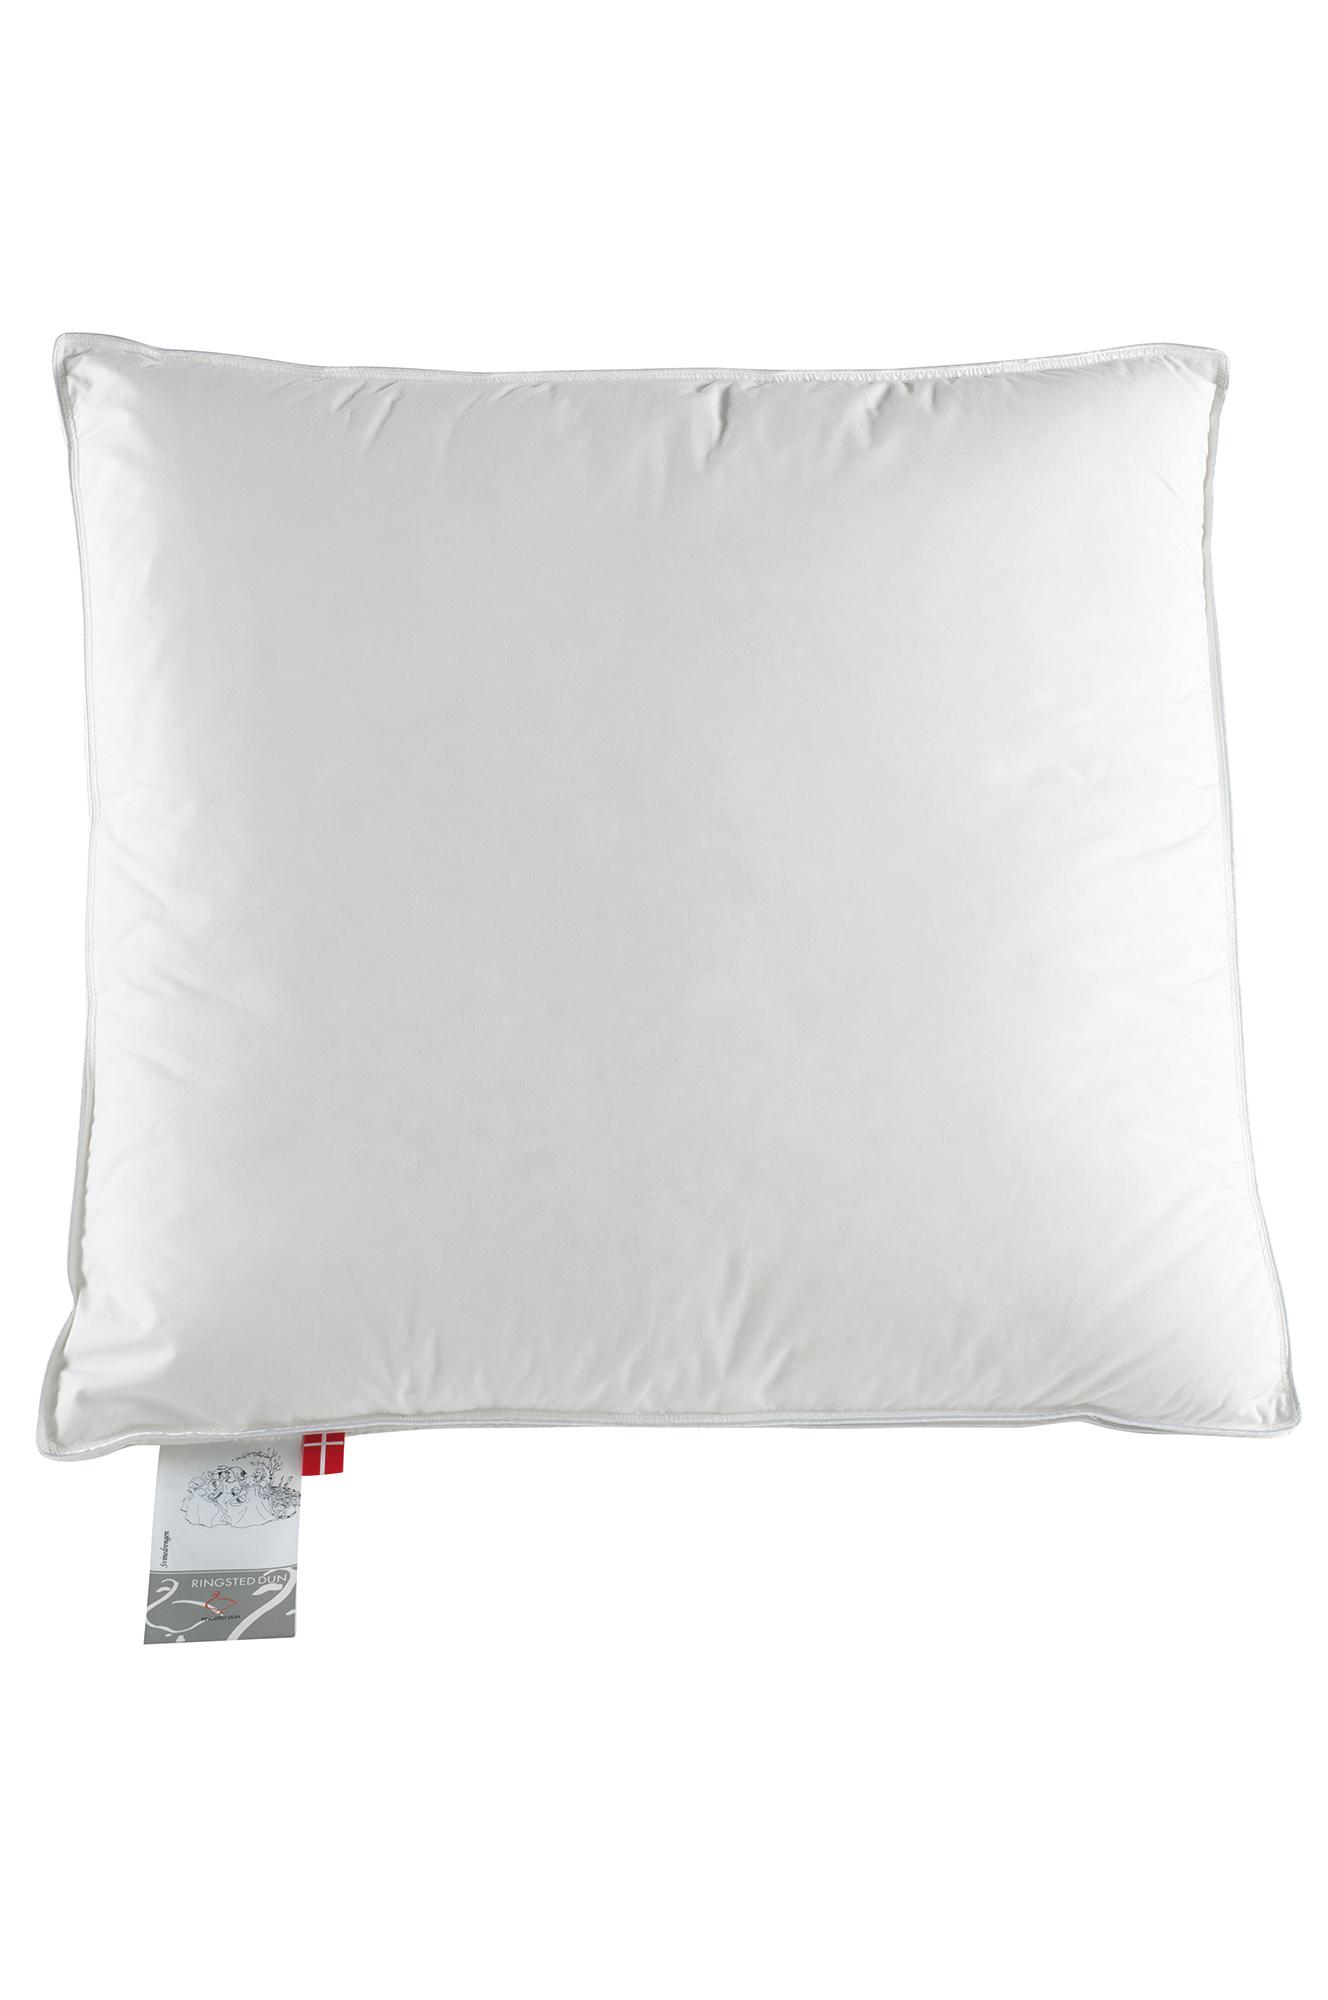 Ylellinen untuvatyyny, medium, 50x60 cm